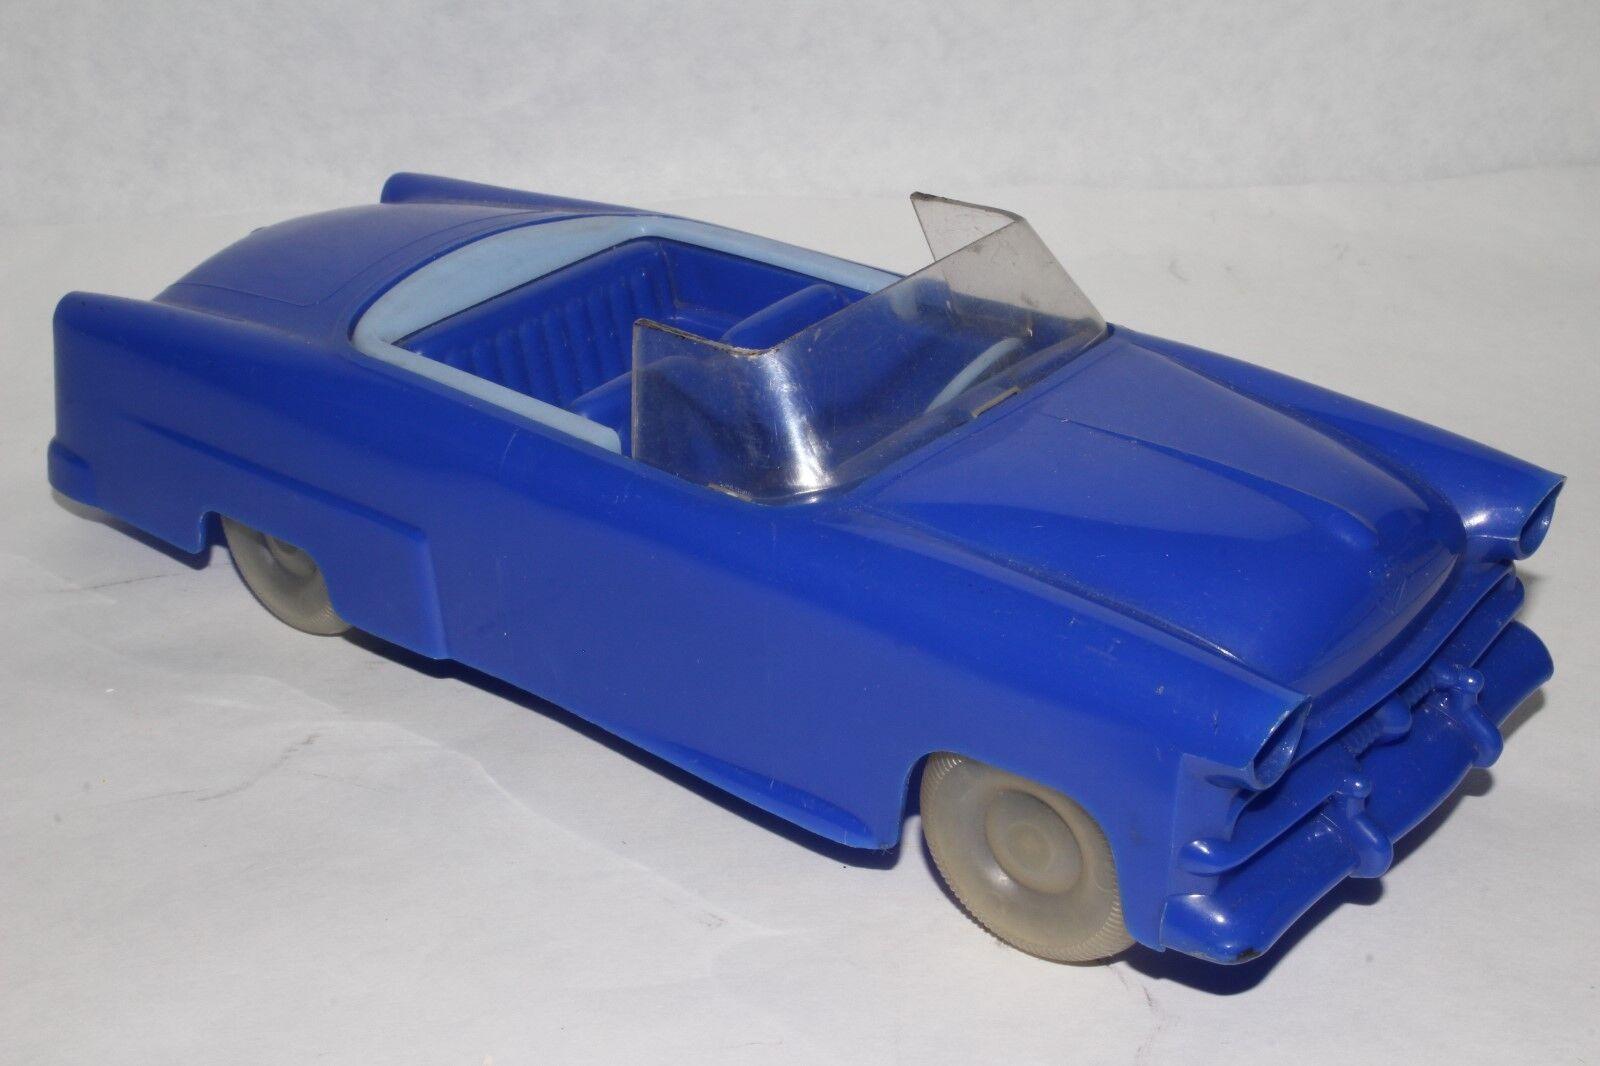 Plástico Grande 1955 Ford Converdeible, Promo tamaño, bonito Original